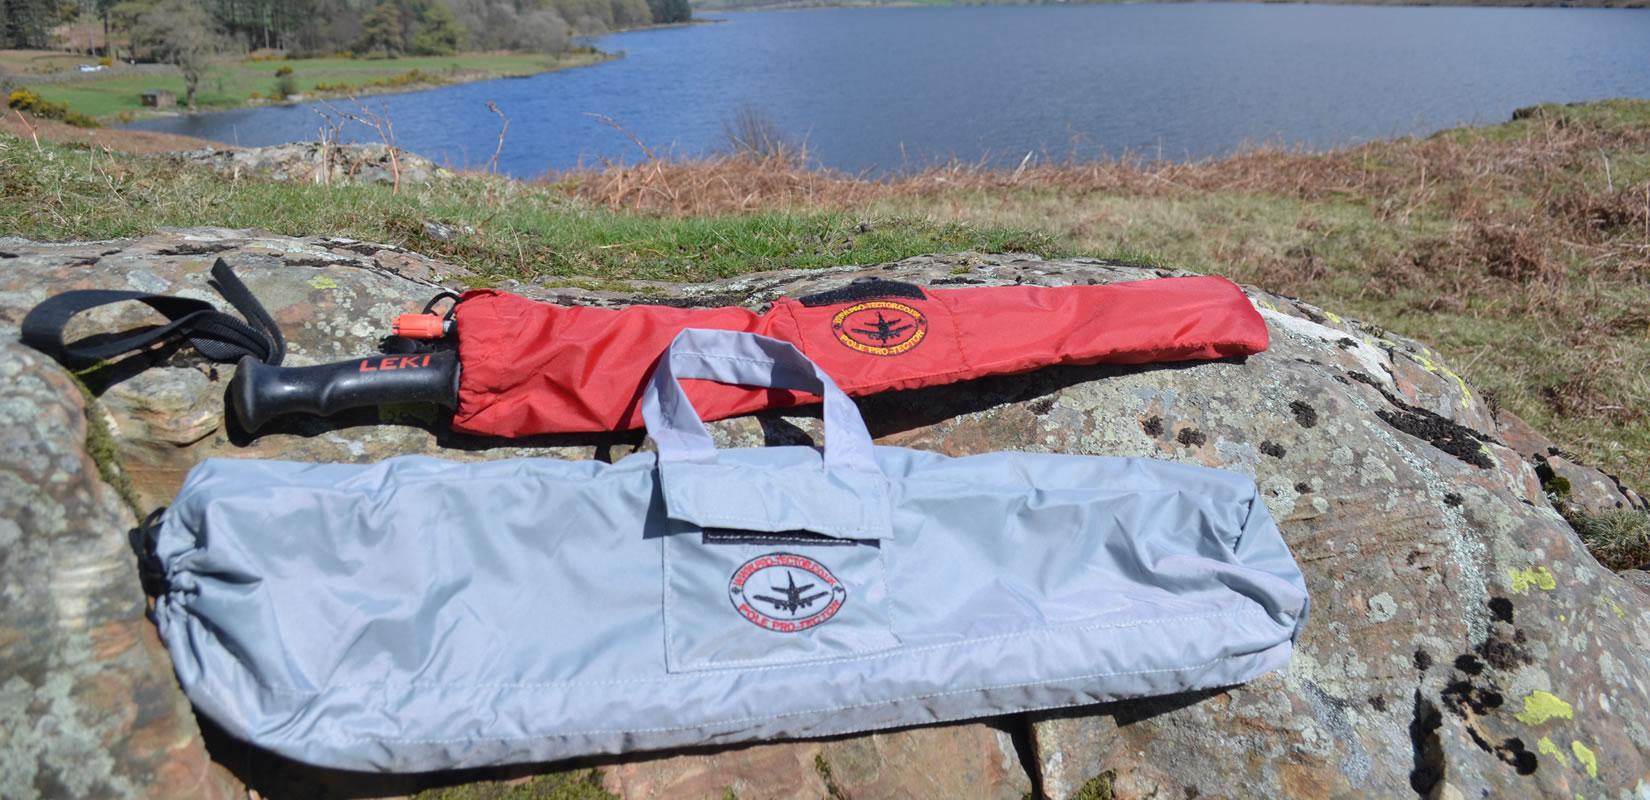 trekking-pole-covers